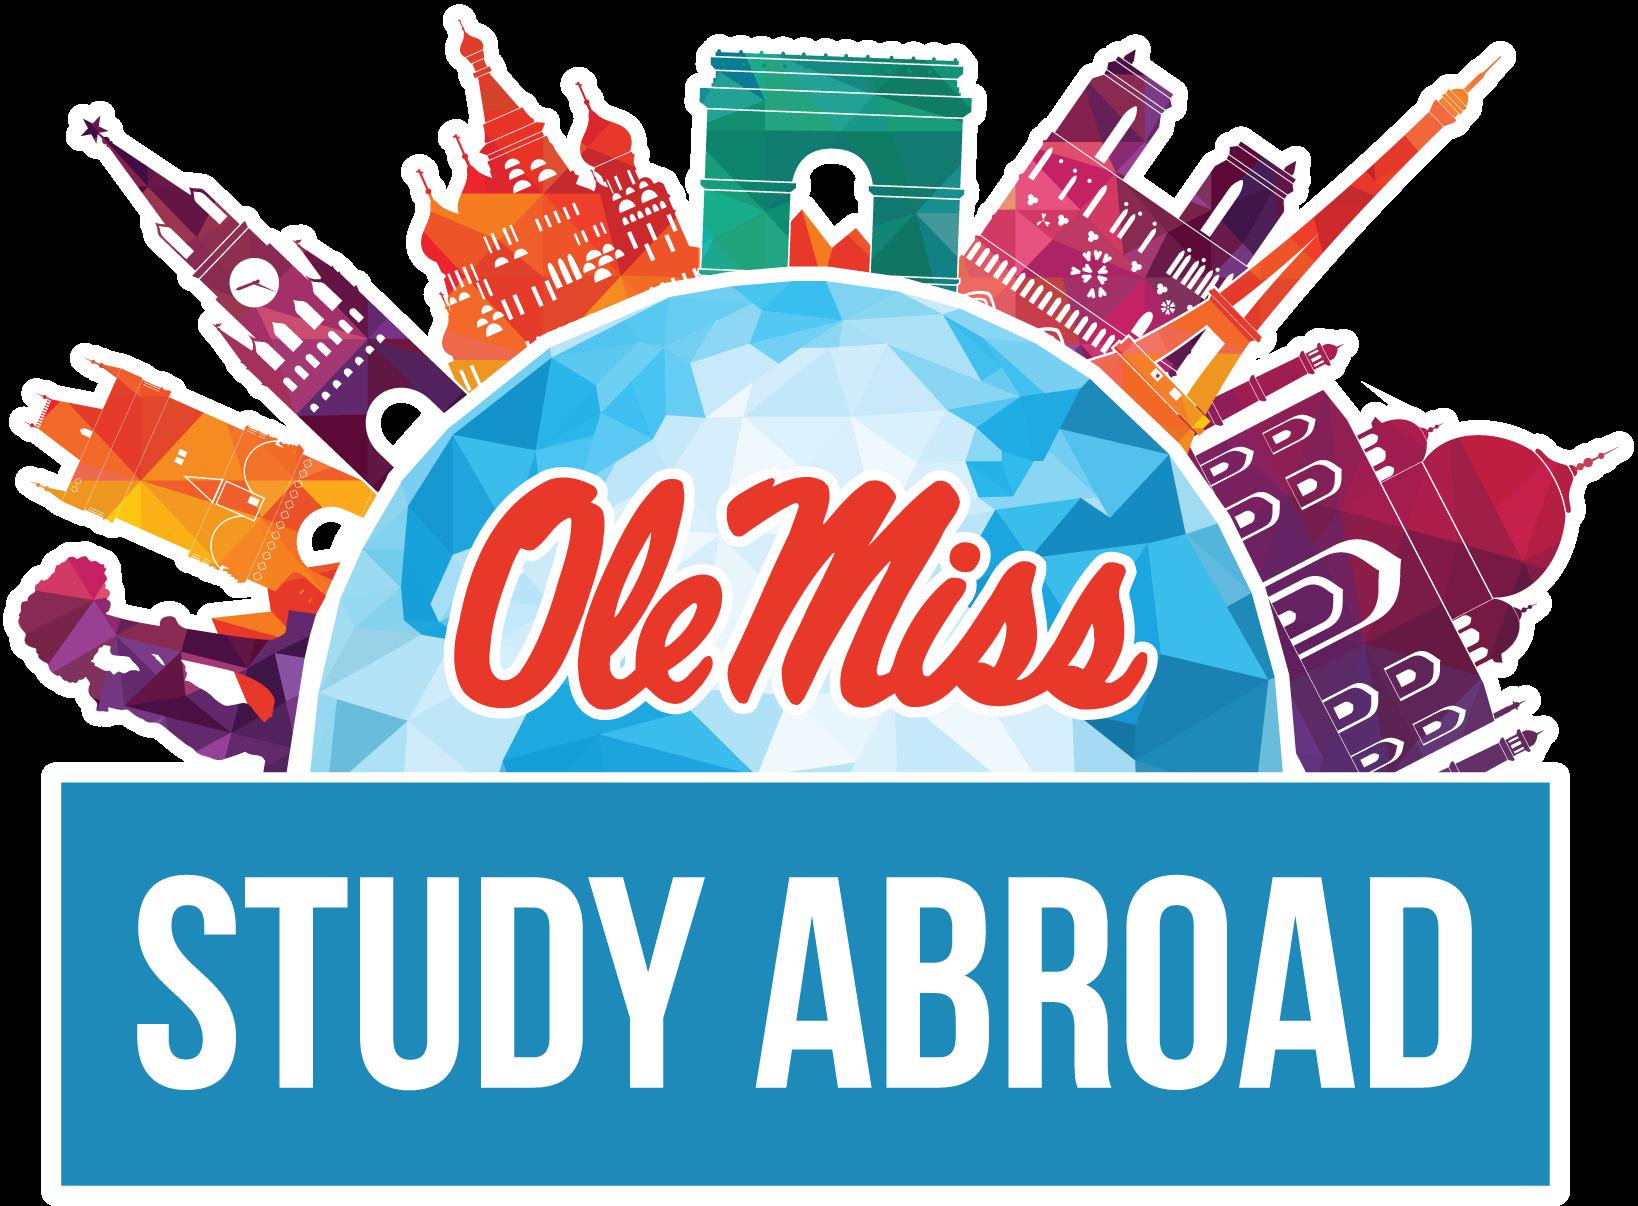 Roc Cook. Study Abroad Advisor. Rockford@olemiss.edu